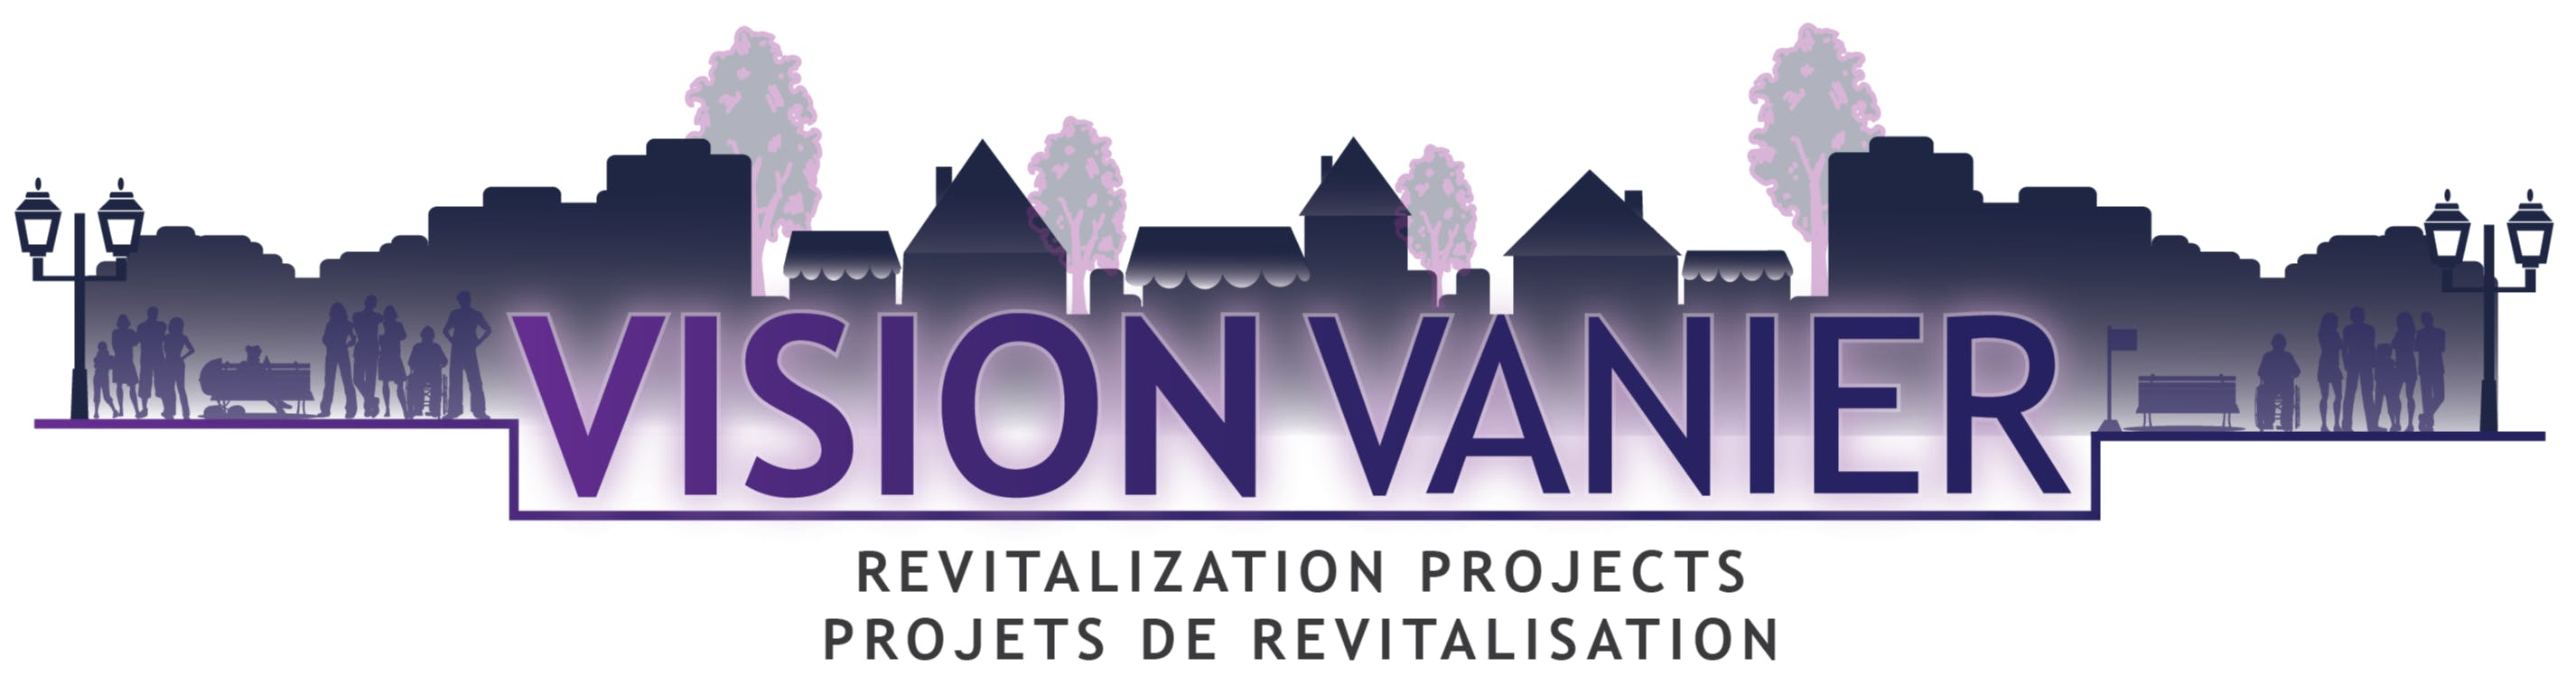 Vision Vanier